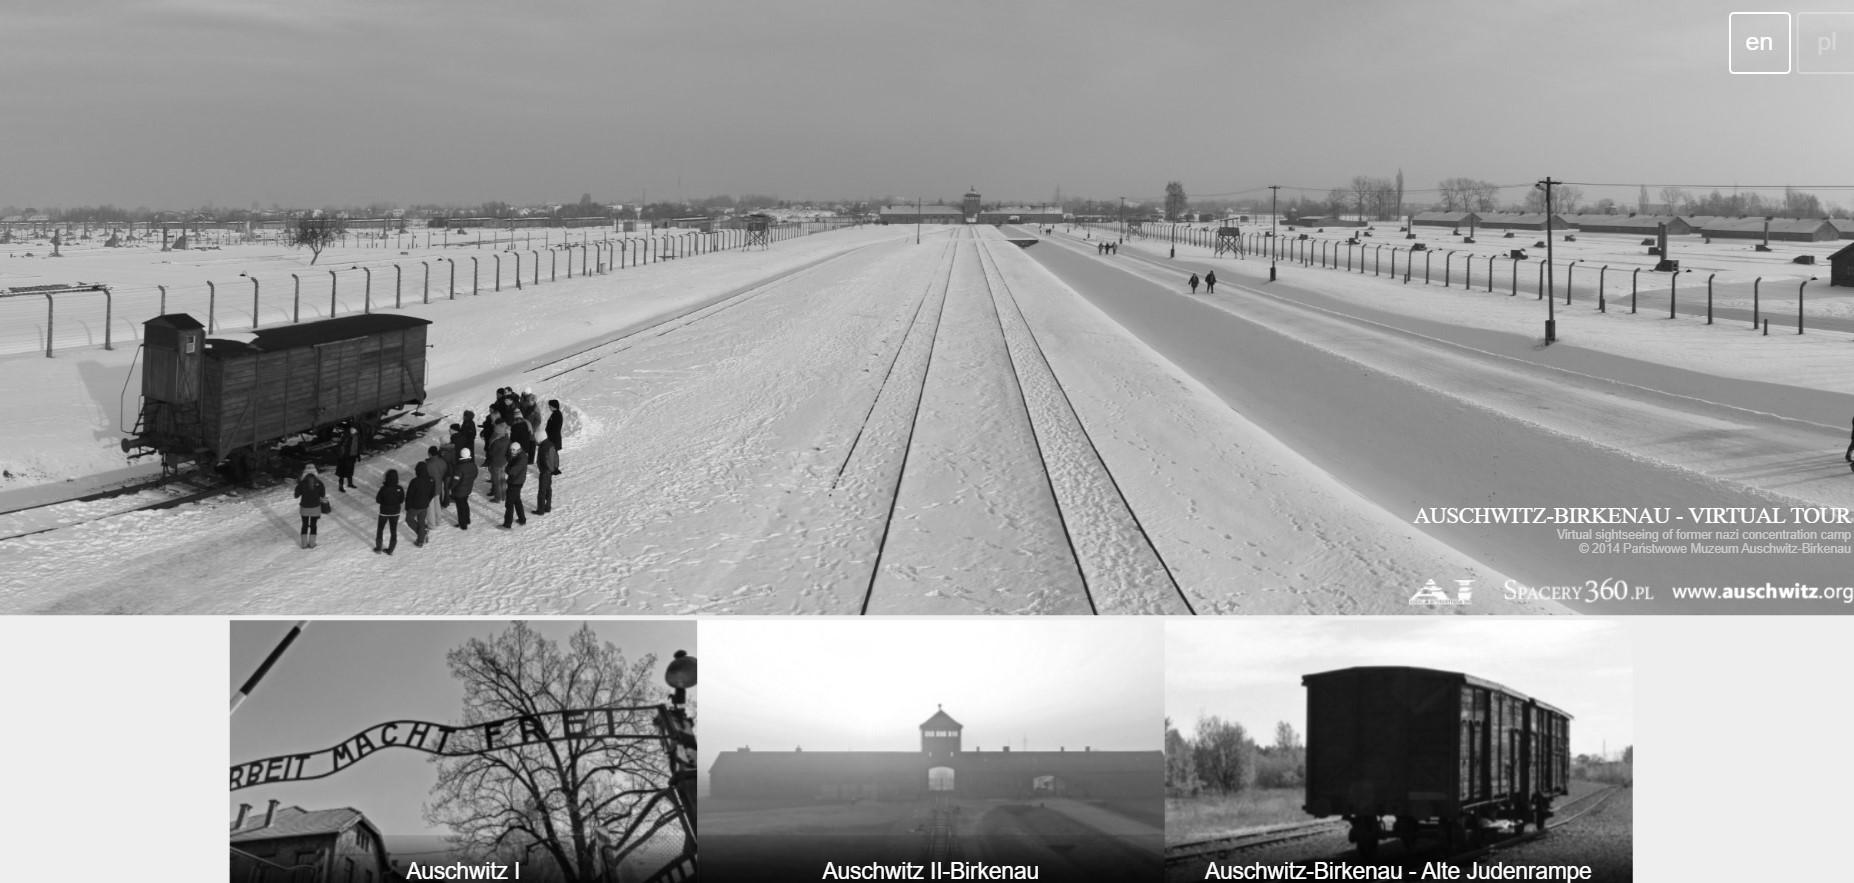 panorama.auschwitz - a way of making a virtual visit to Auschwitz-Birkenau memorial